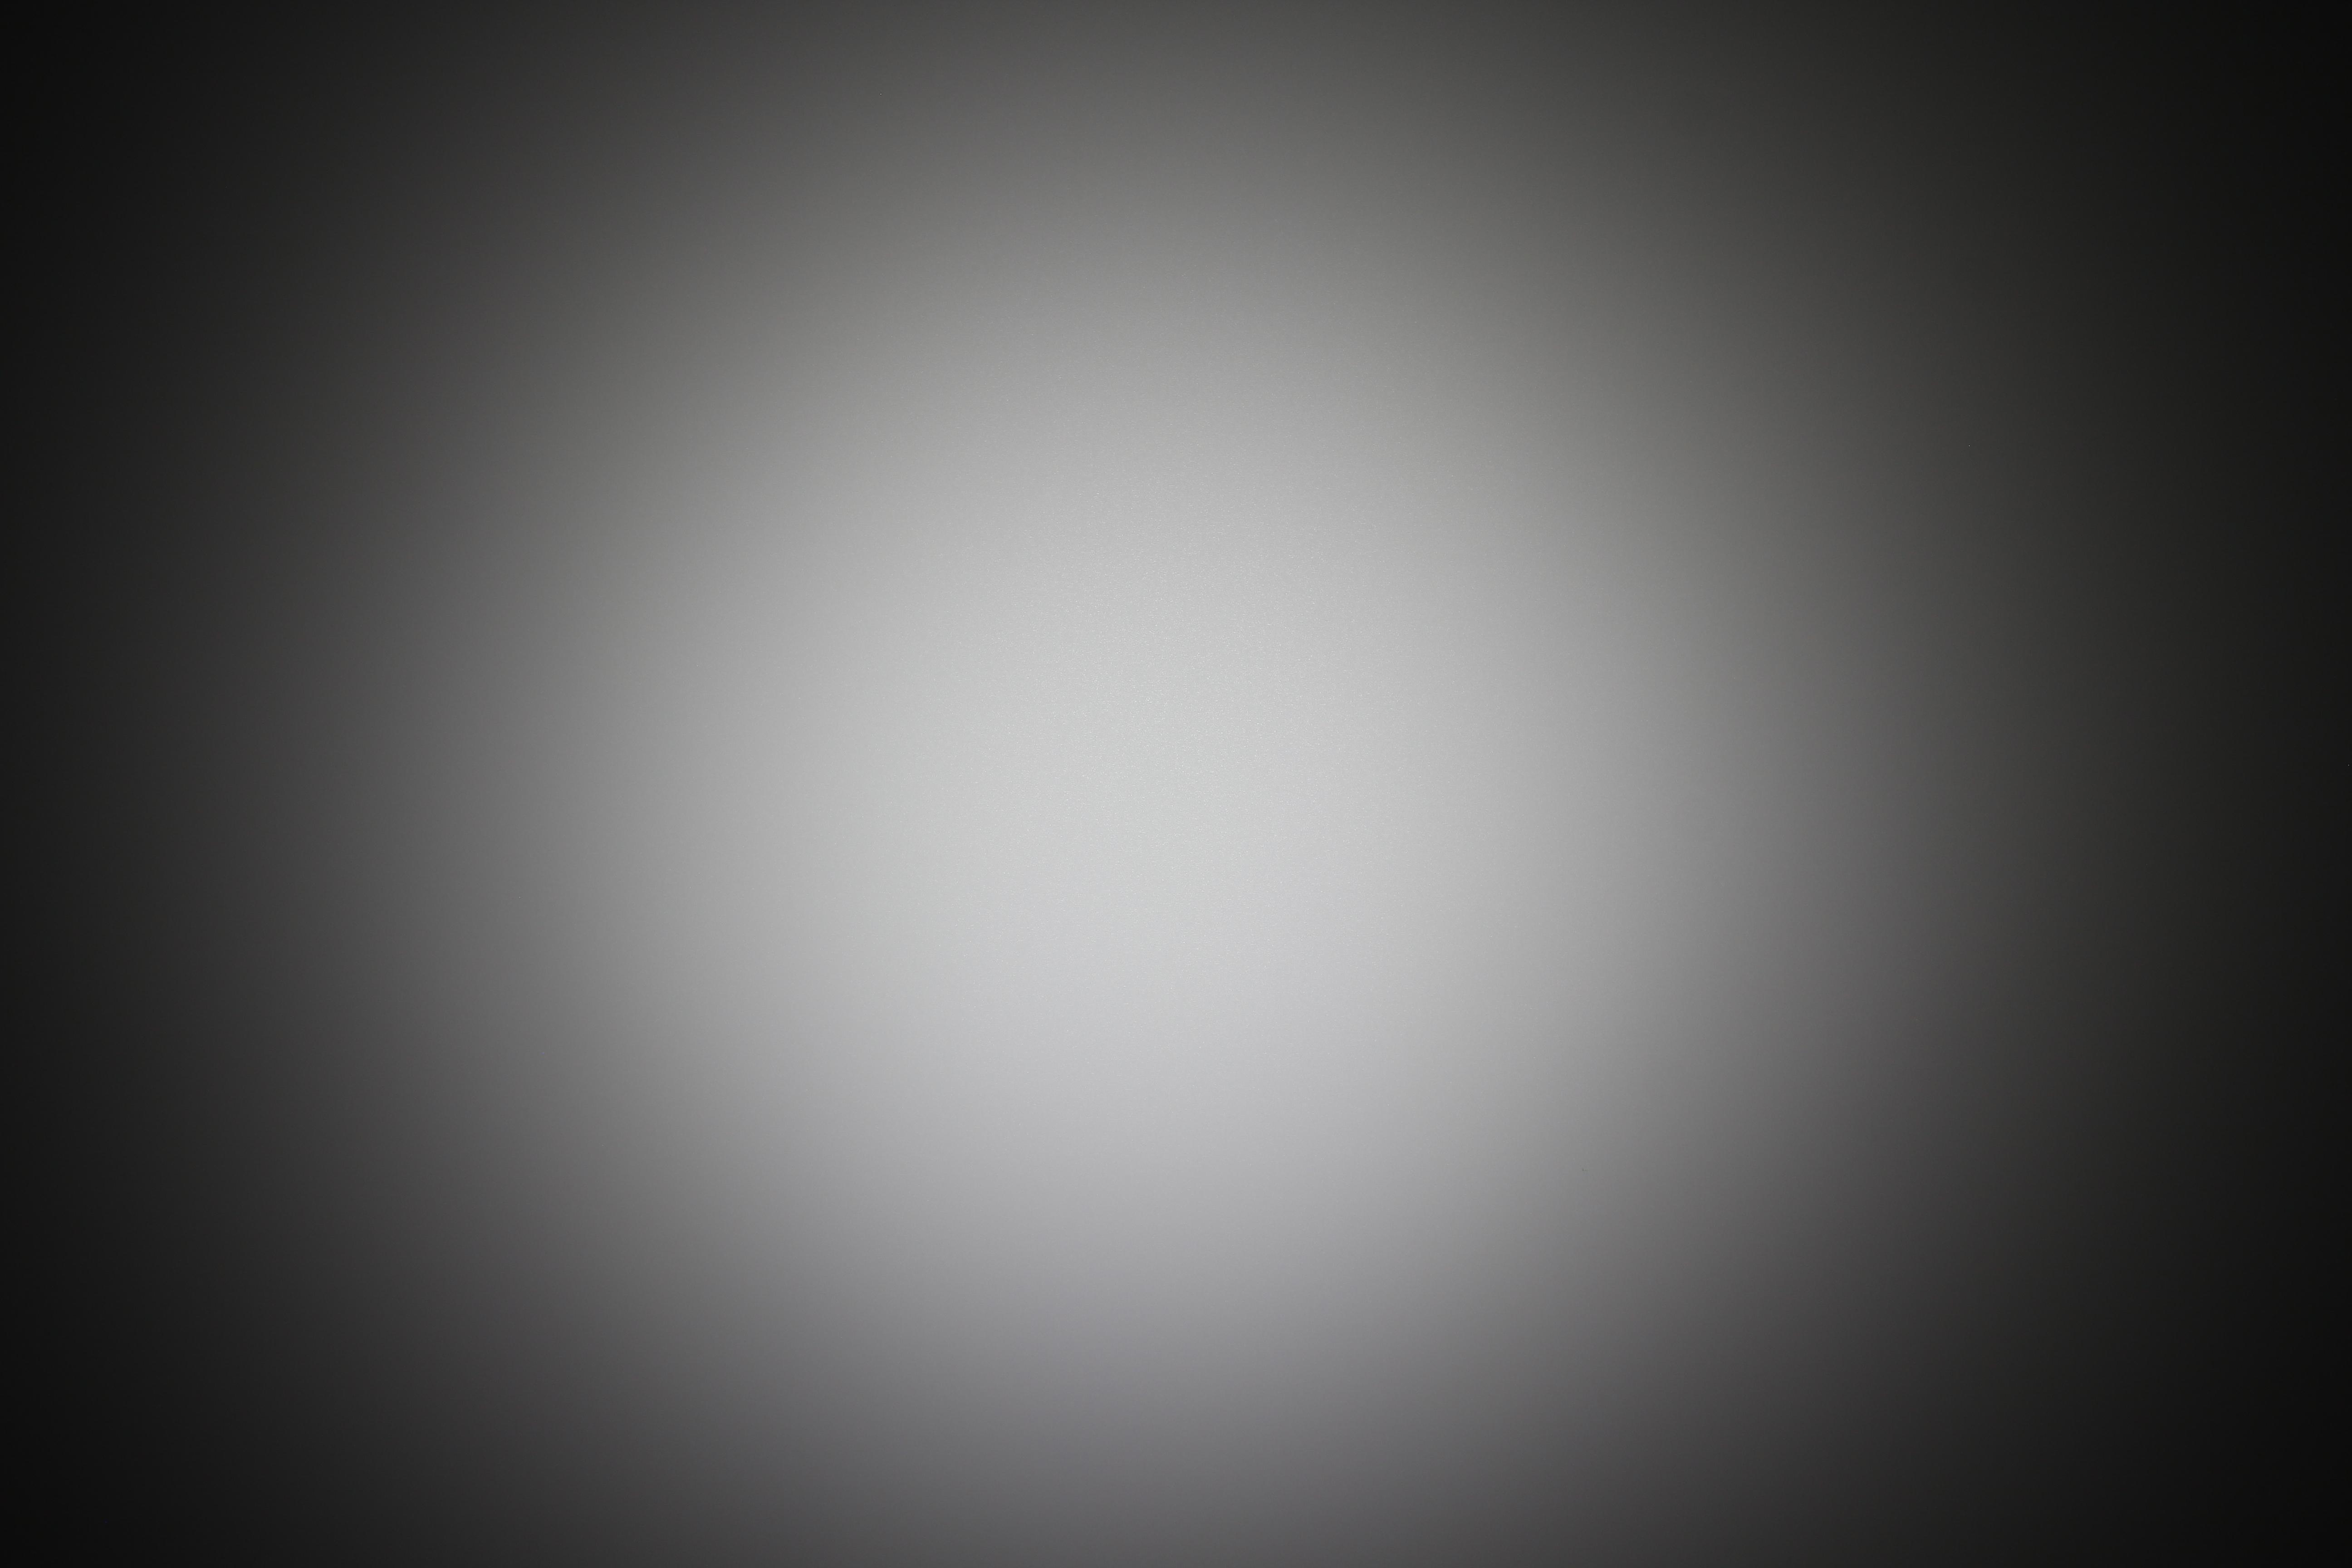 transparent black background - HD3000×2002